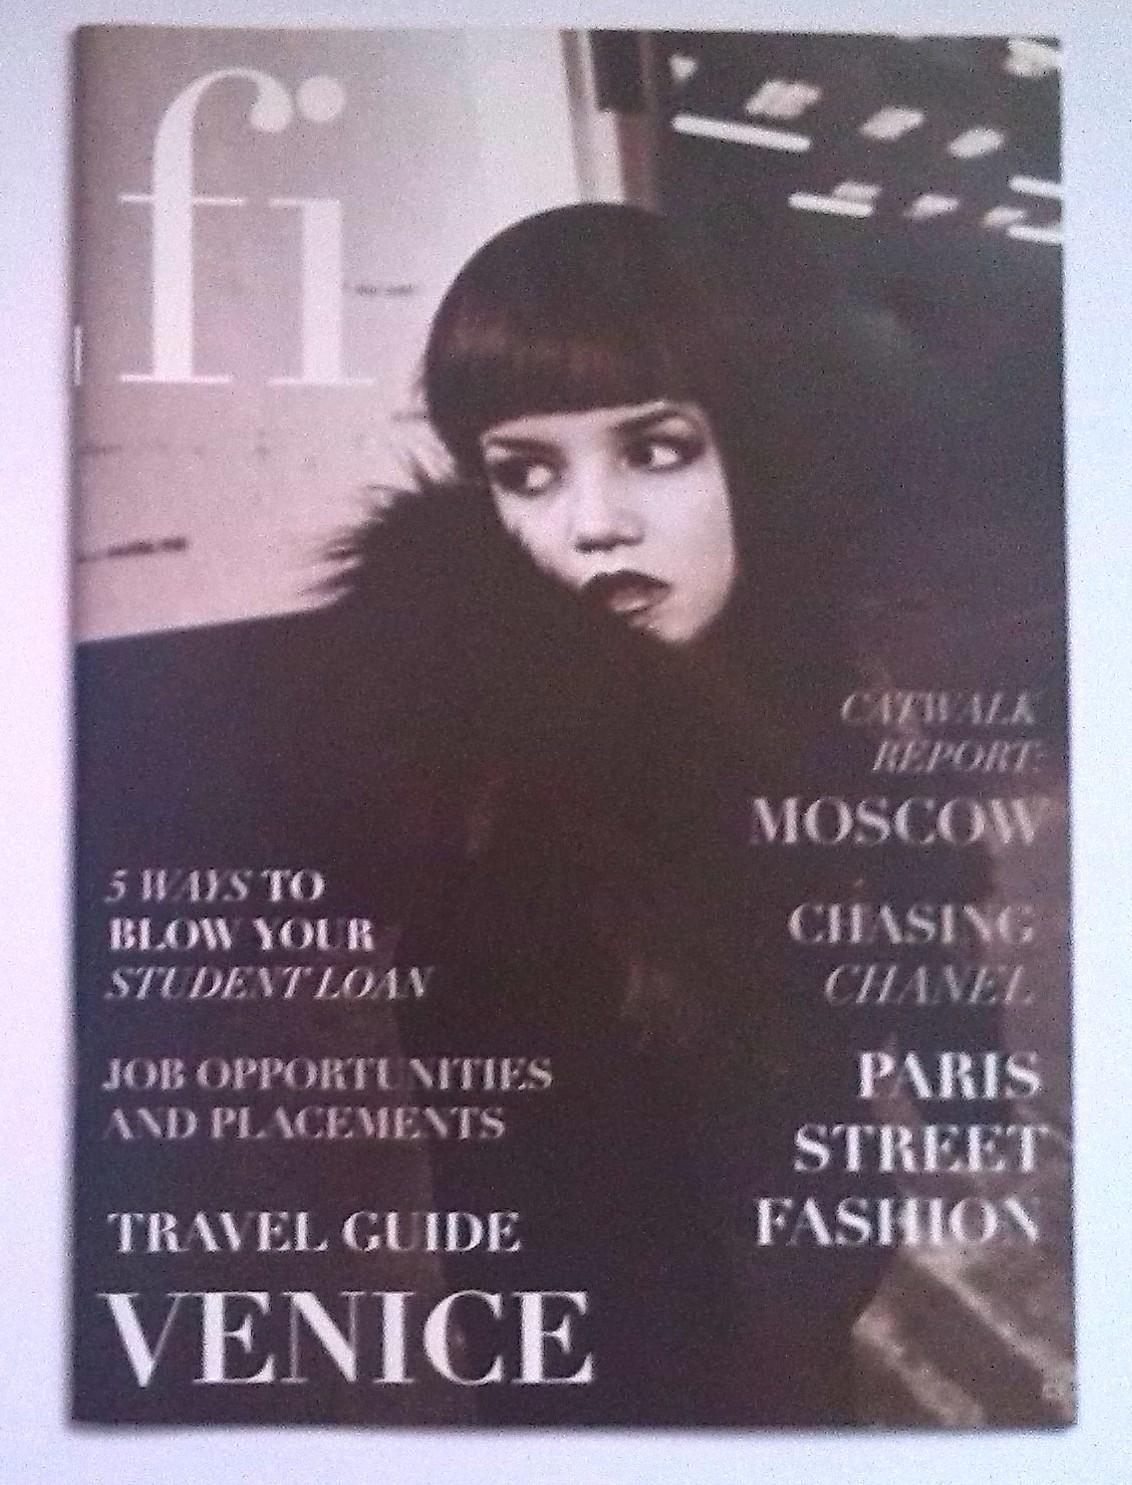 Fashion Insider magazine